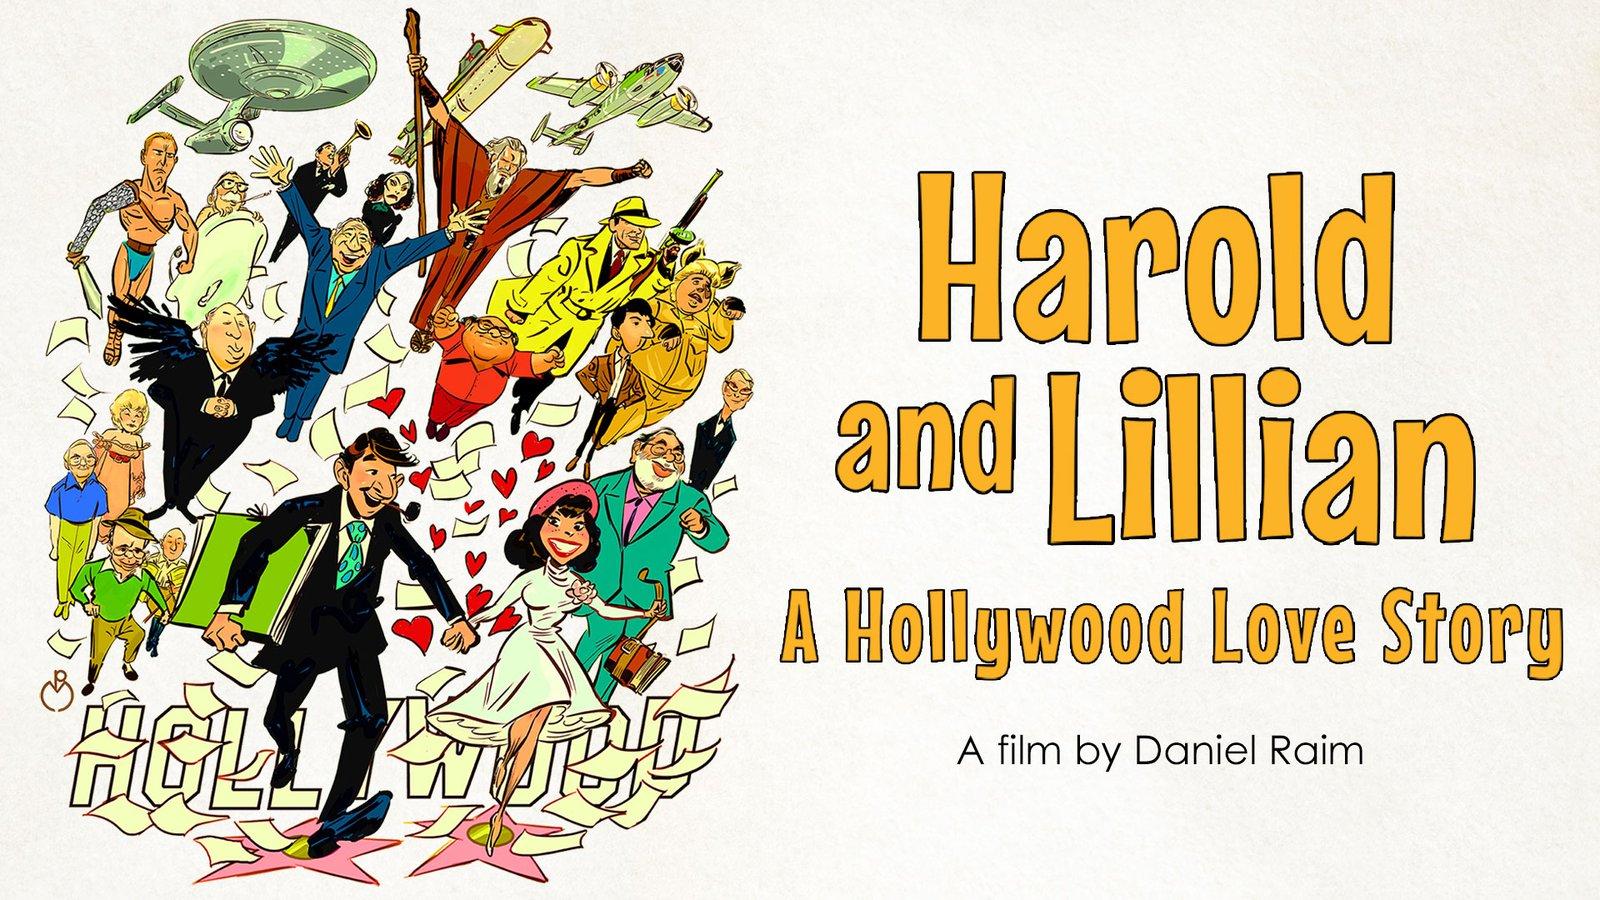 Harold and Lillian - A Hollywood Love Story